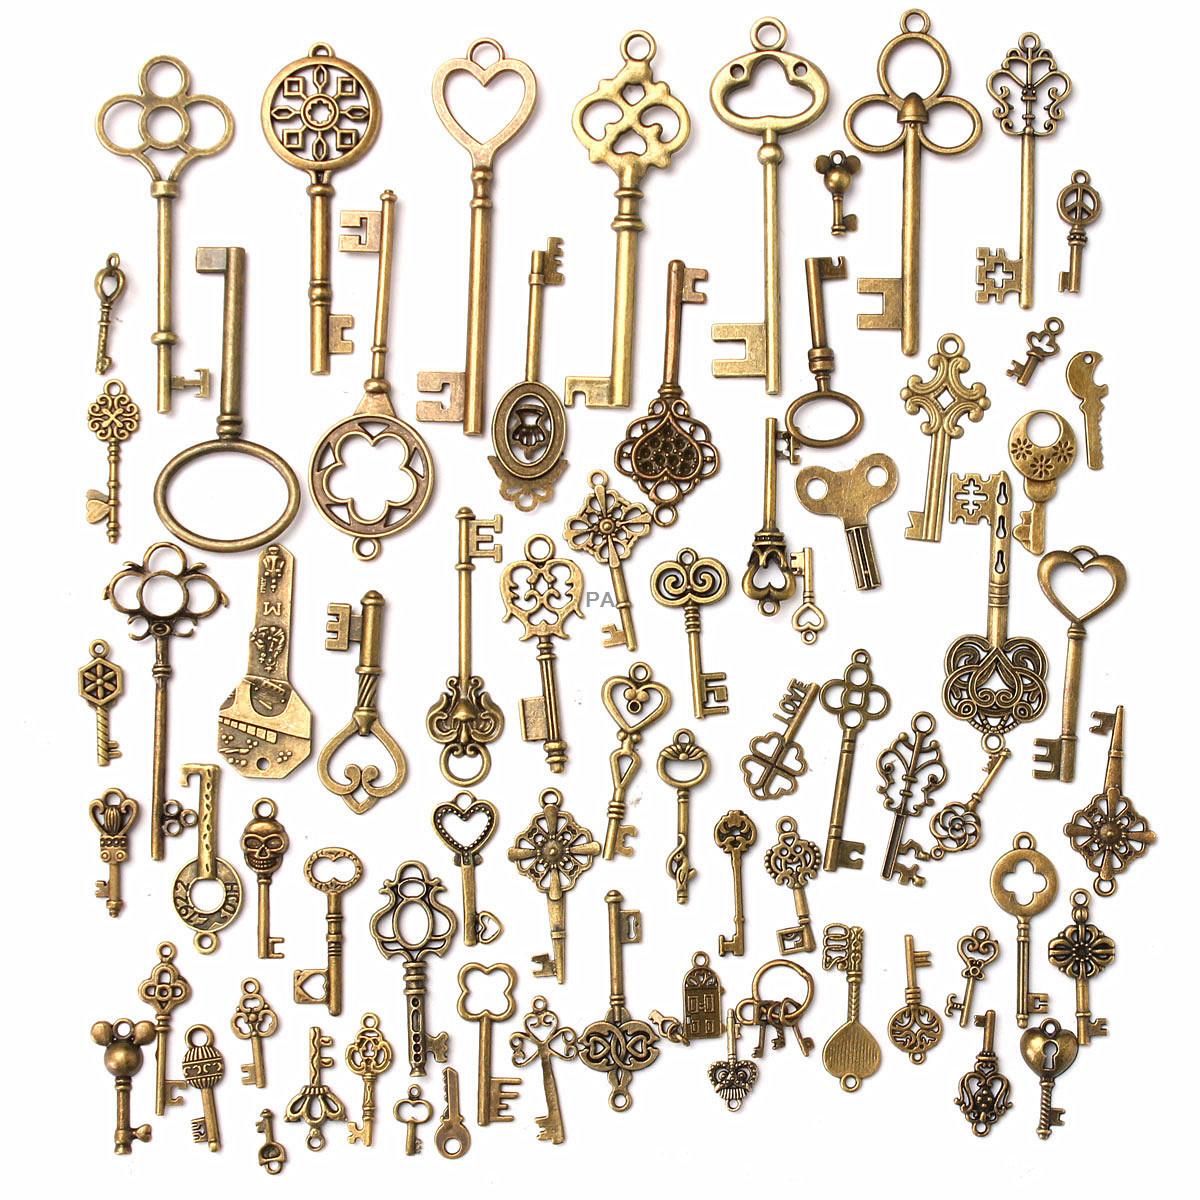 15x Antique Vintage Pendant Heart Bow Lock Steampunk Old Look Skeleton Key Set